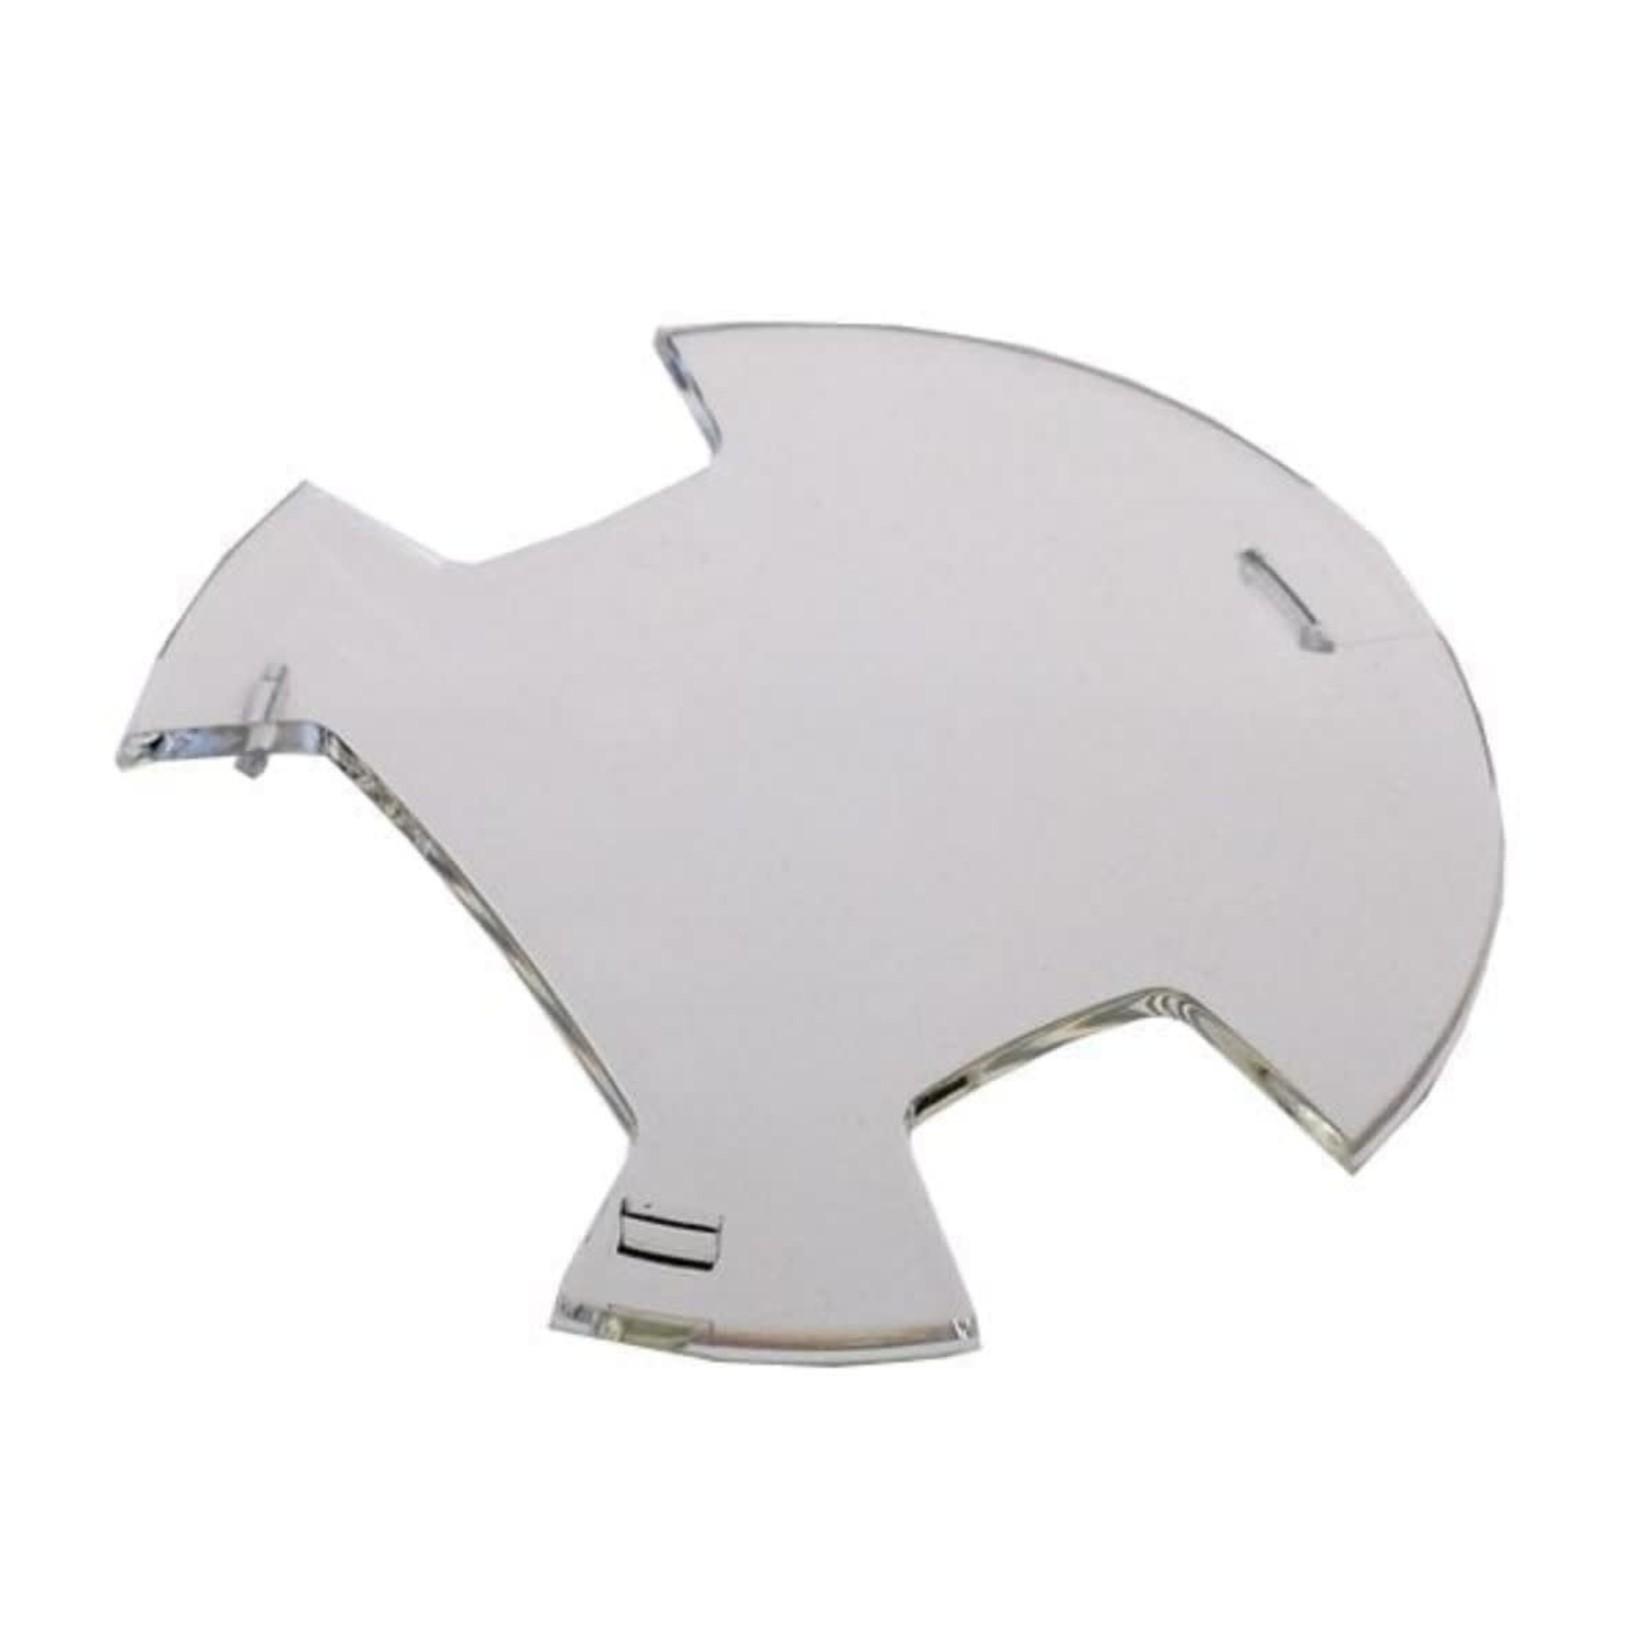 Suunto Display Shield Vyper2/Vyper Air/HelO2 (1 pc)